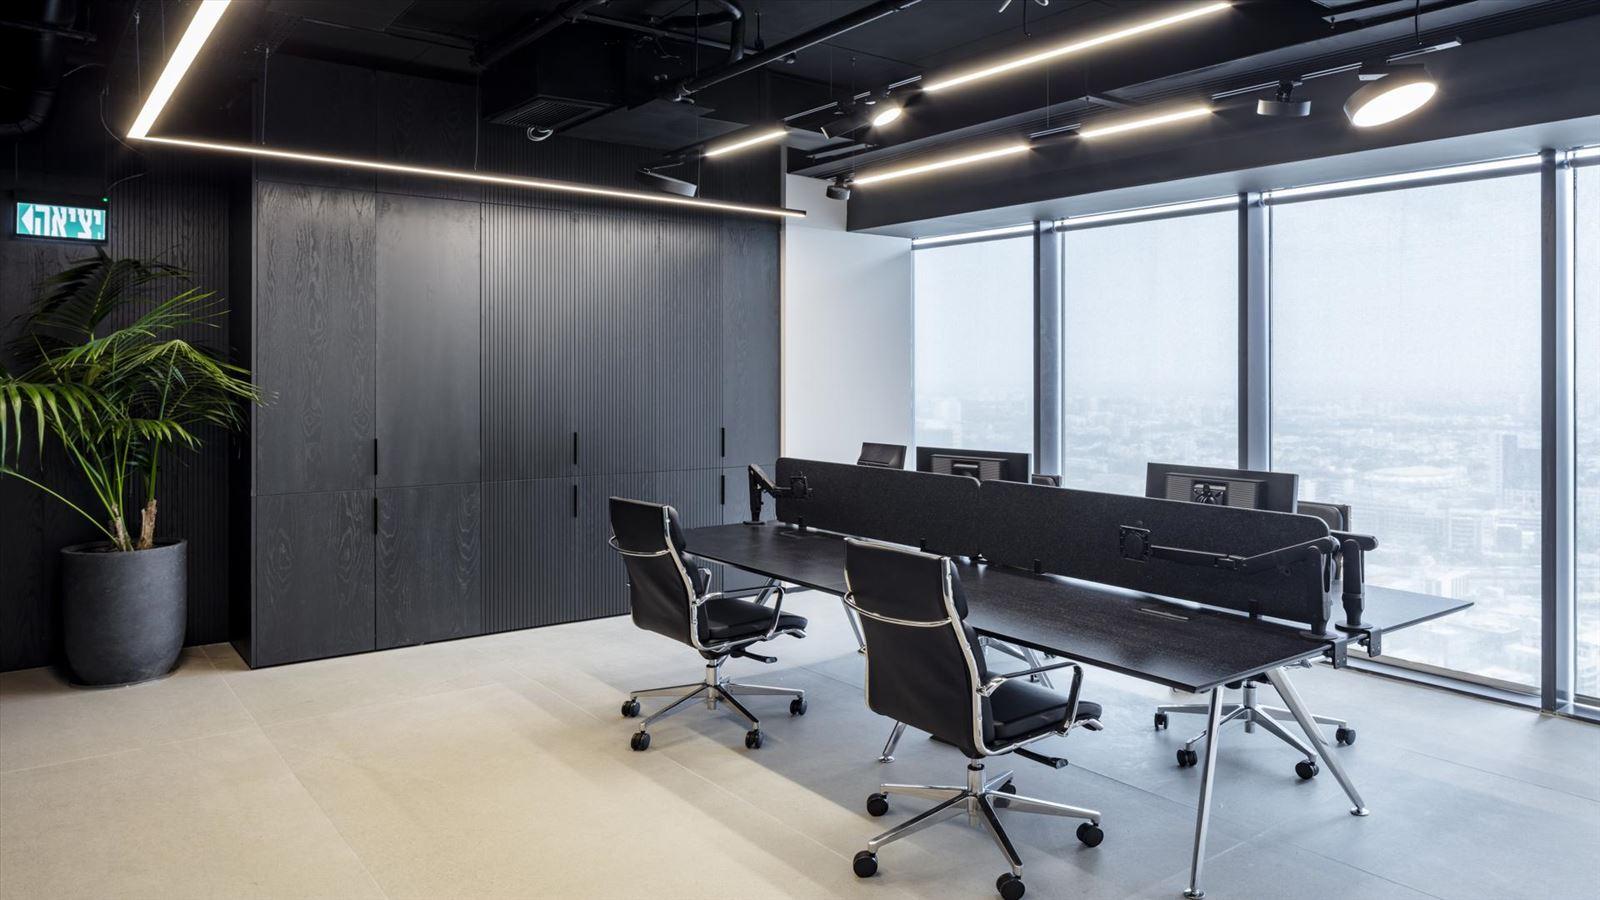 Fortissimo Offices – Tel Aviv חדר העבודה בגופי תאורה מרשימים בעיצובו של דורי קמחי